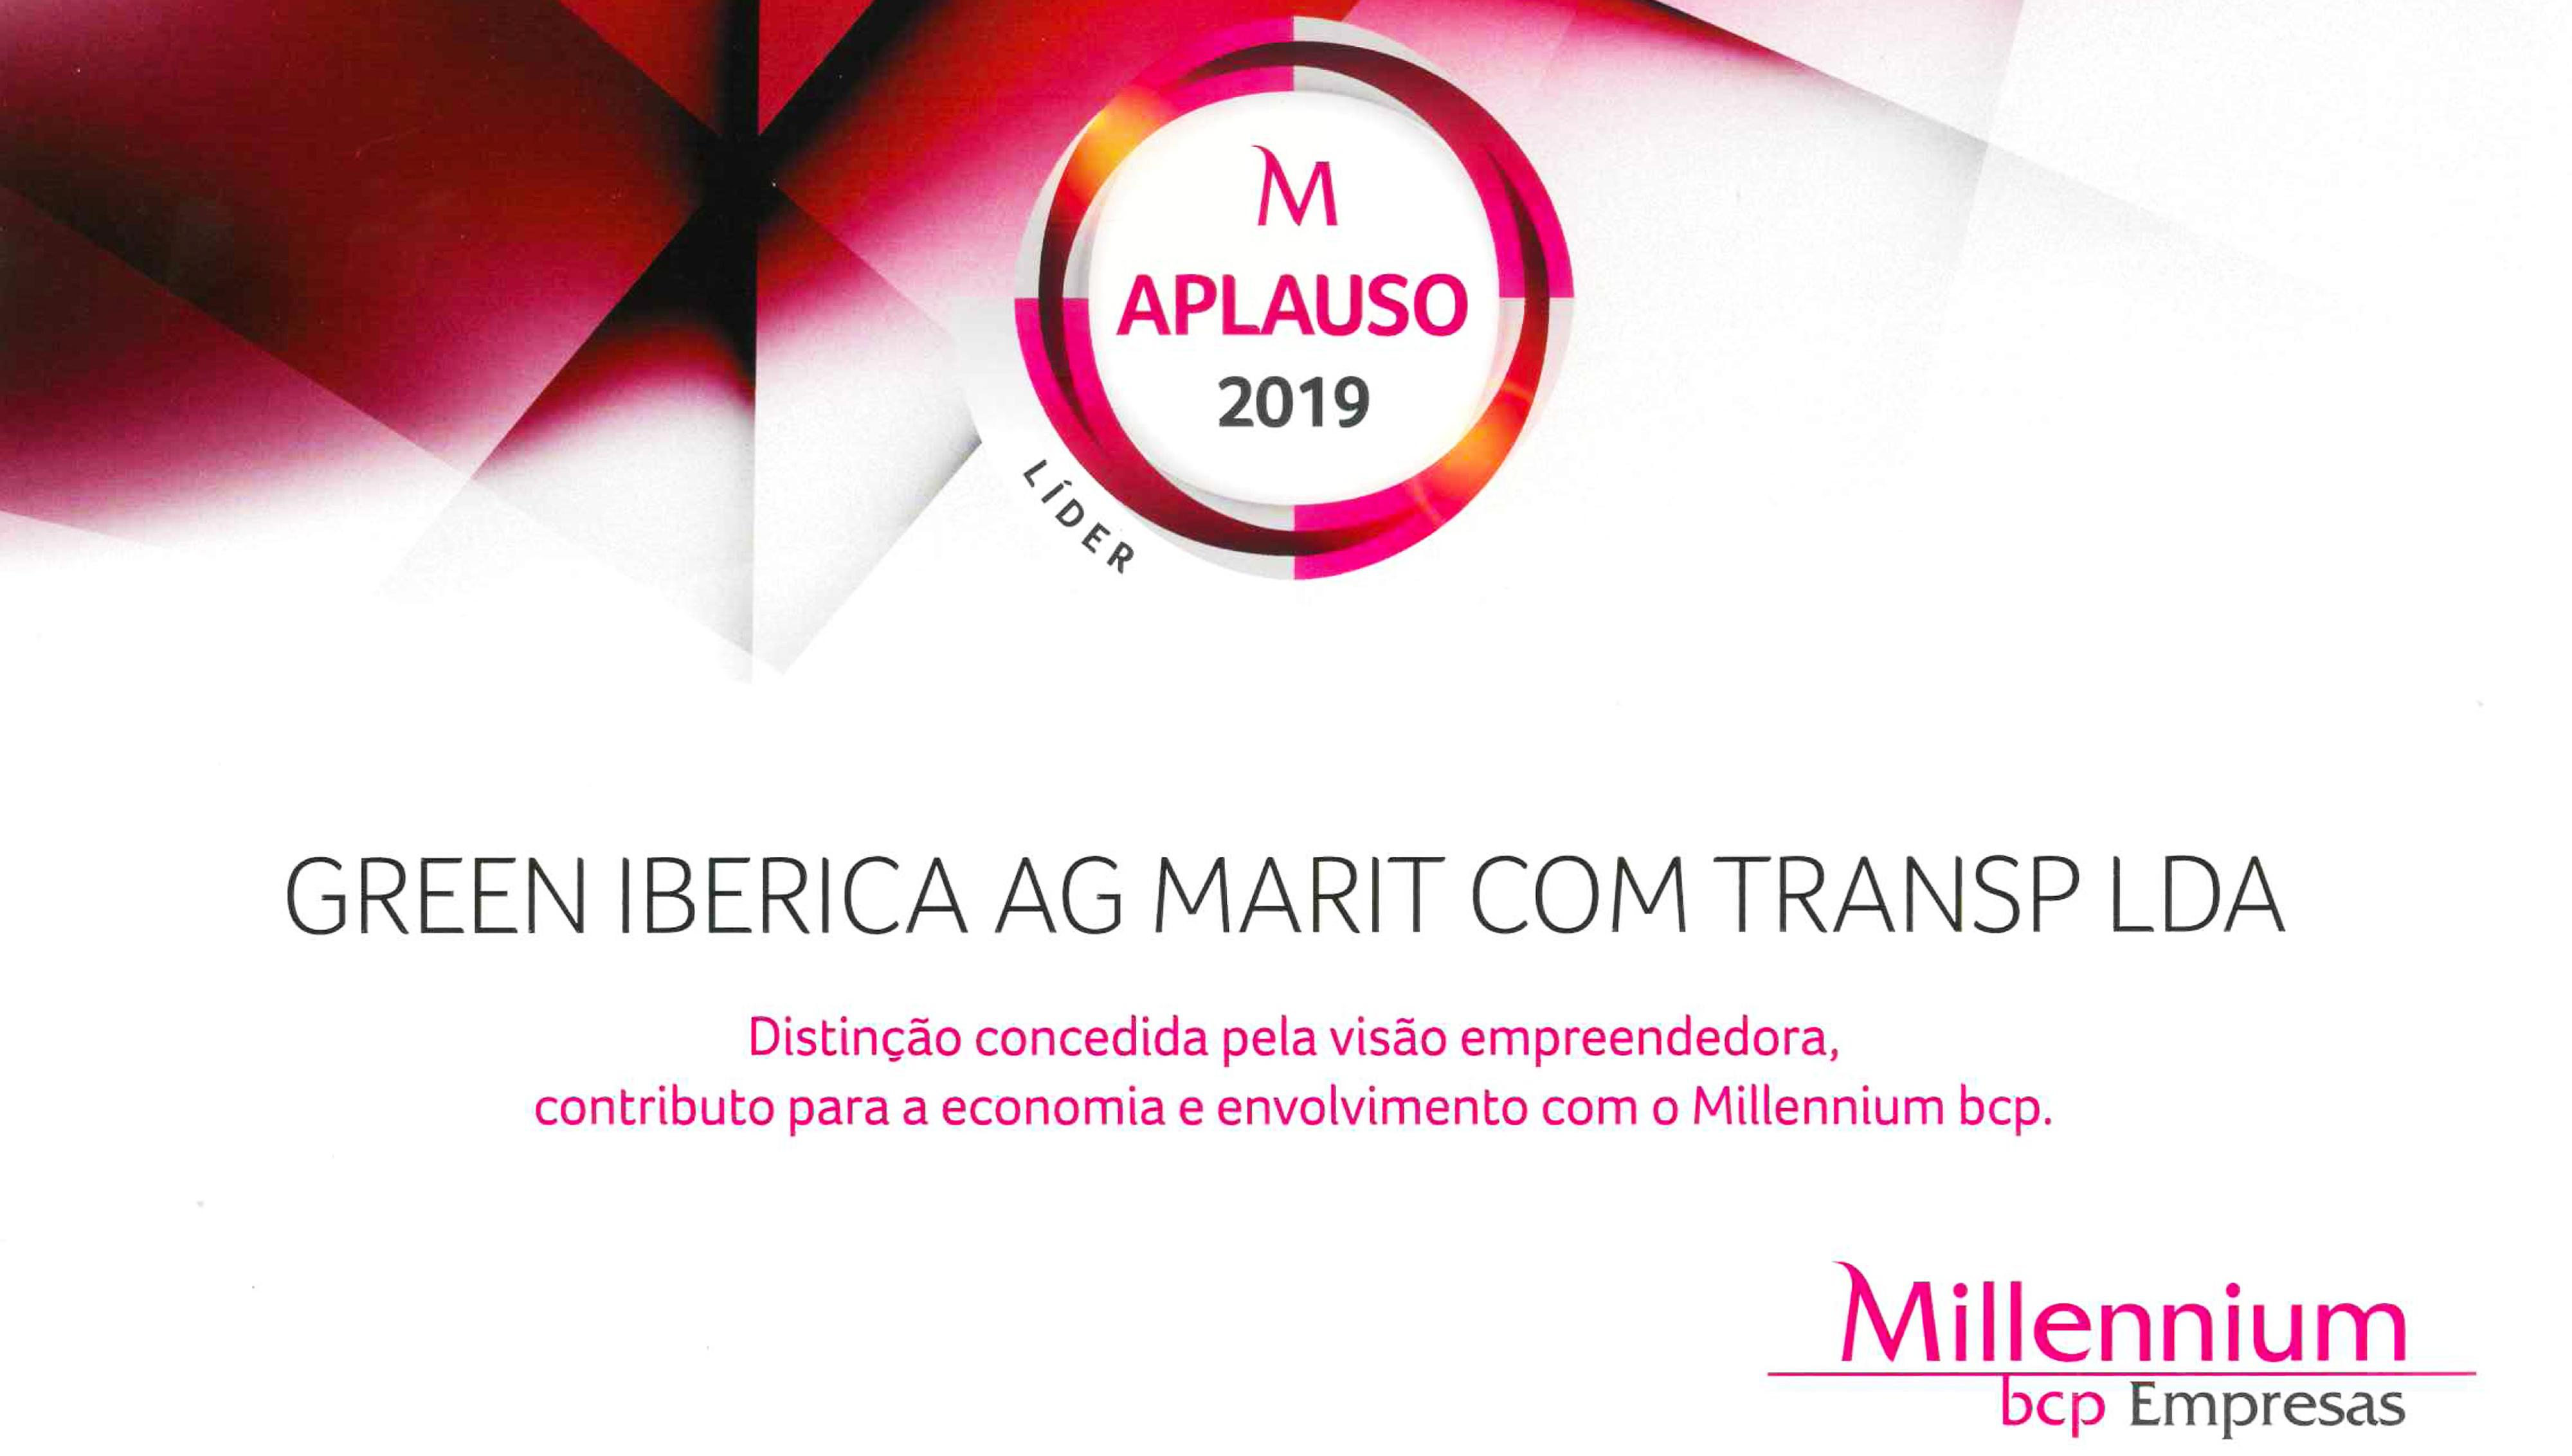 Empresa Aplauso 2019 - Green Ibérica